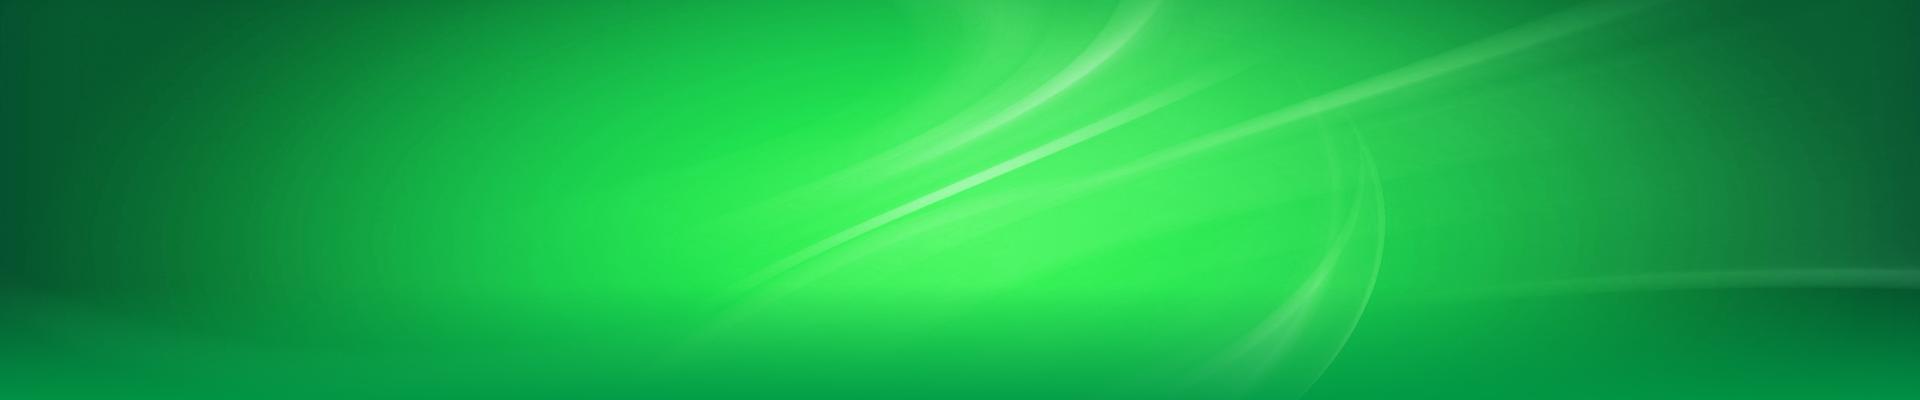 fondo_ani_verde